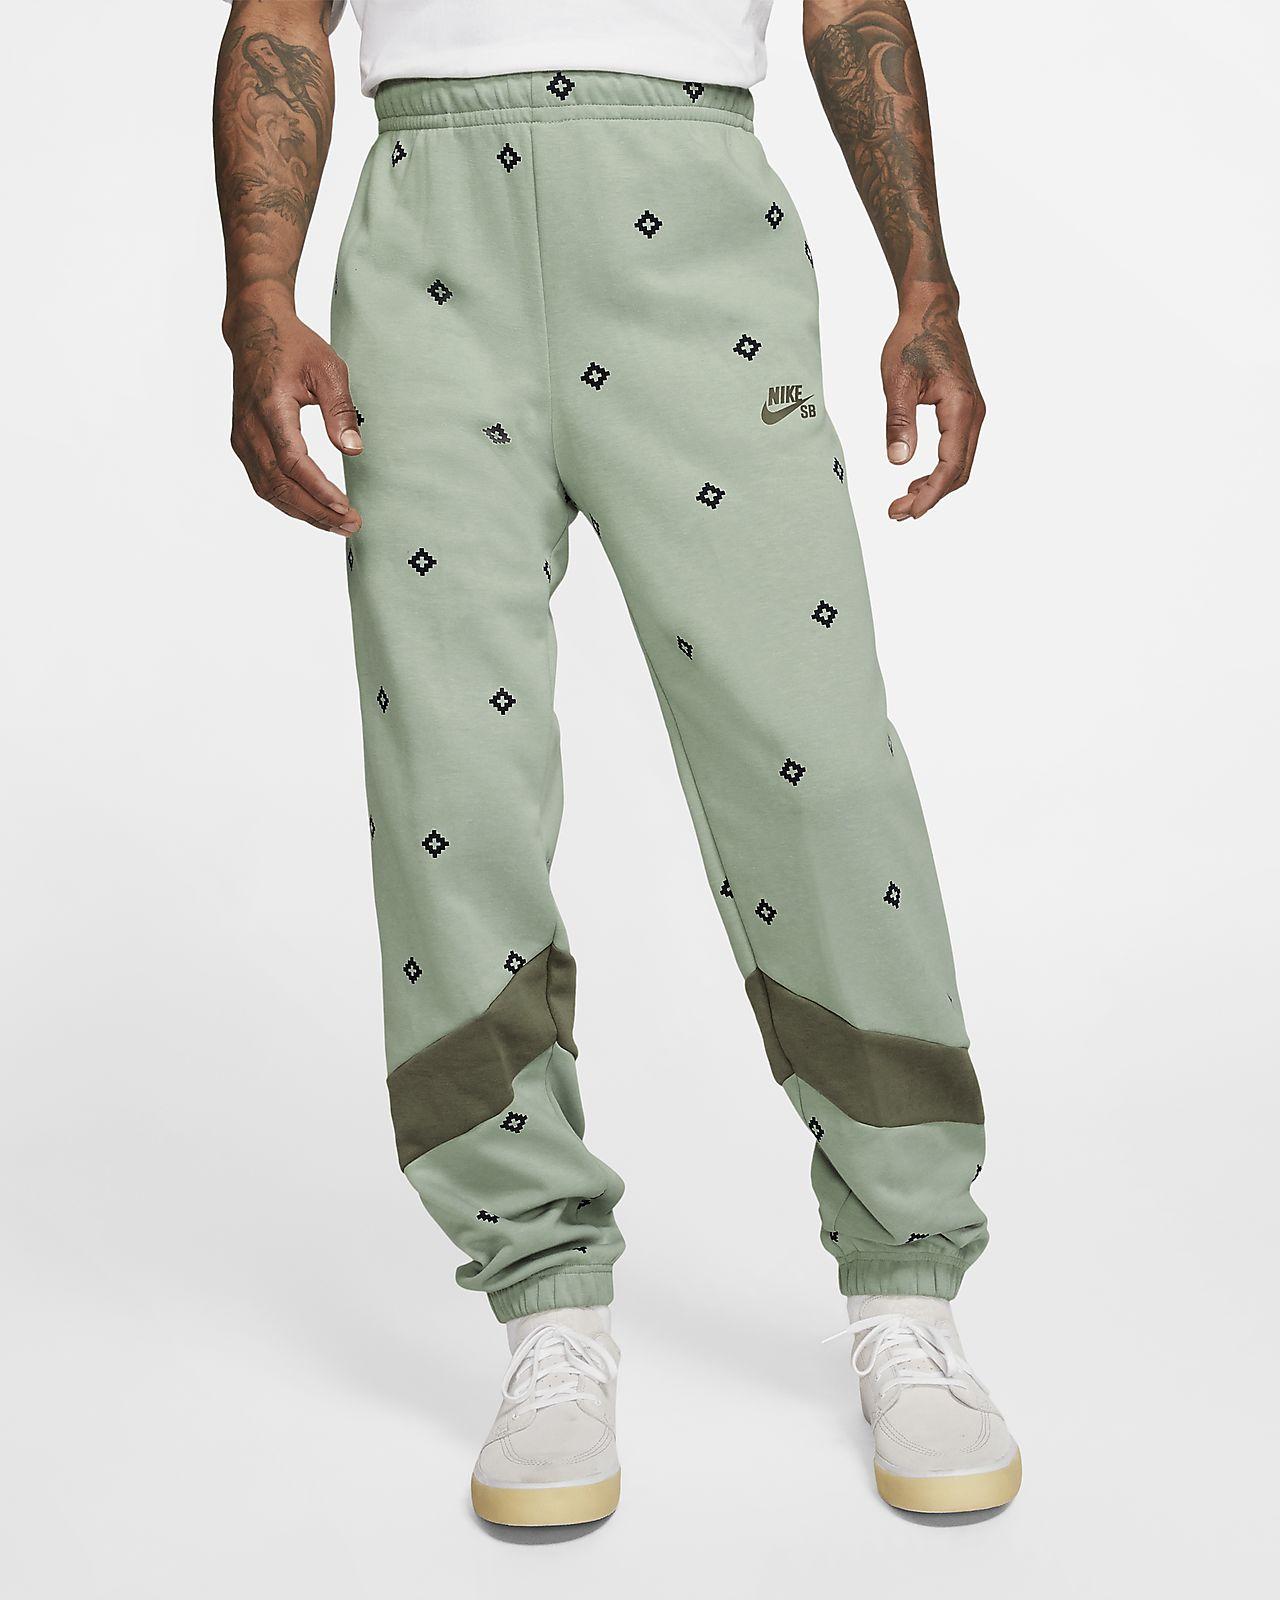 Nike SB Dri-FIT Men's Printed Skate Tracksuit Bottoms